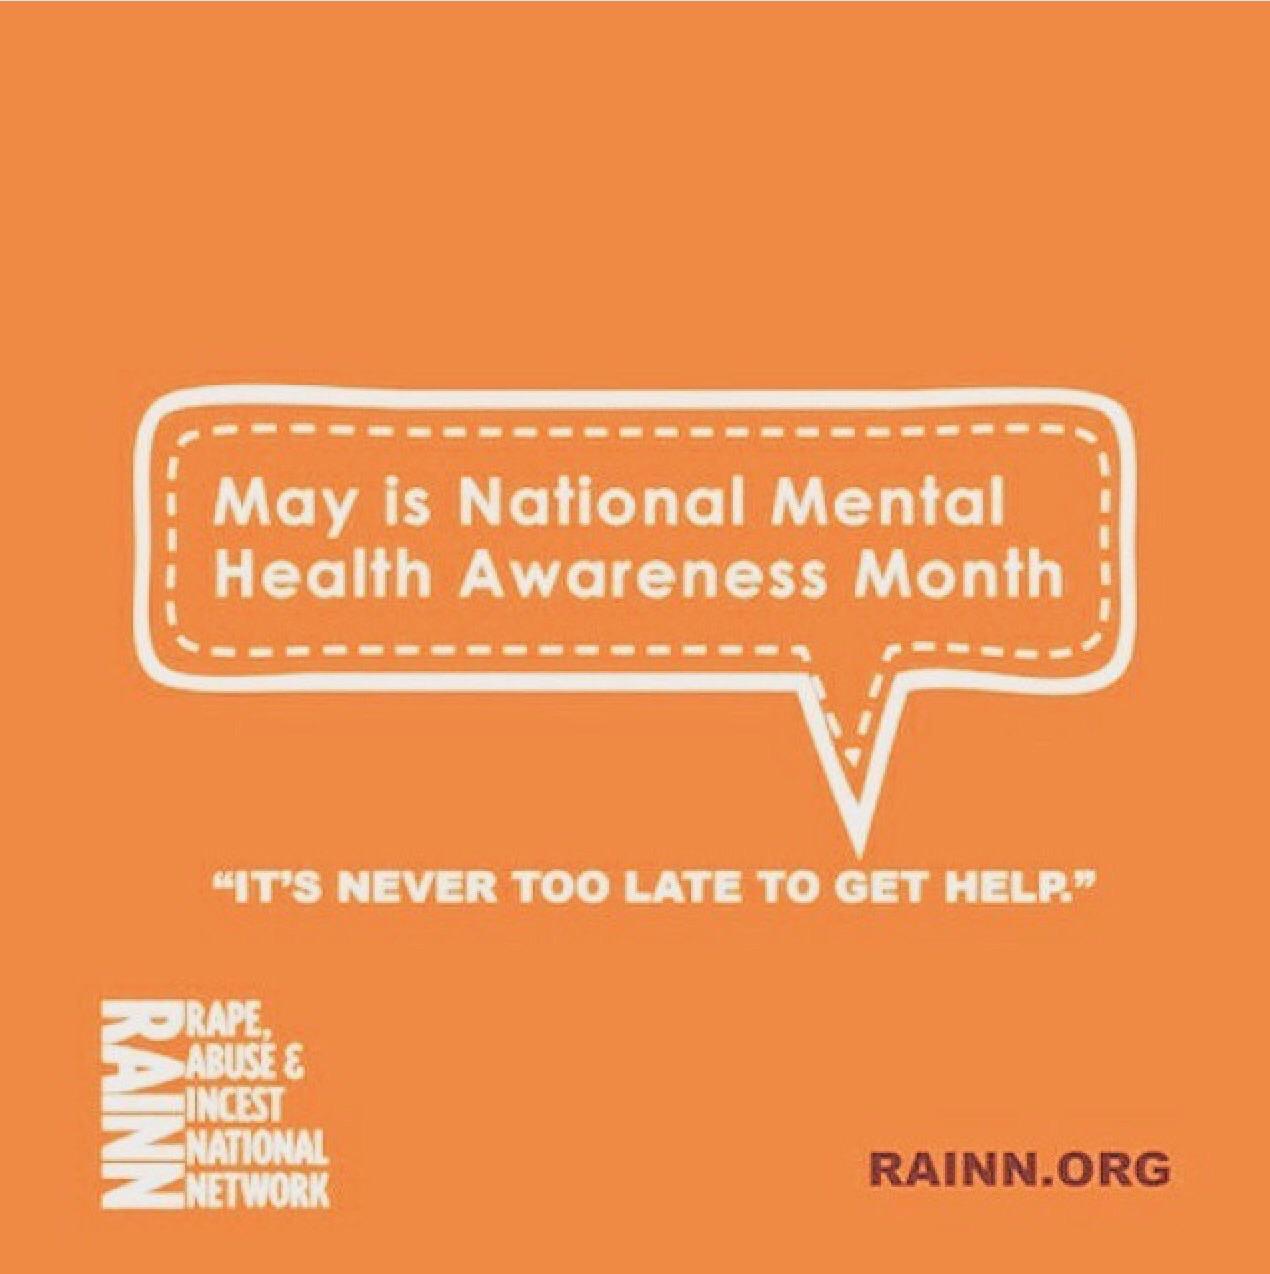 www.rainn.org - rape, abuse, & incest national network - a comprehensive resource